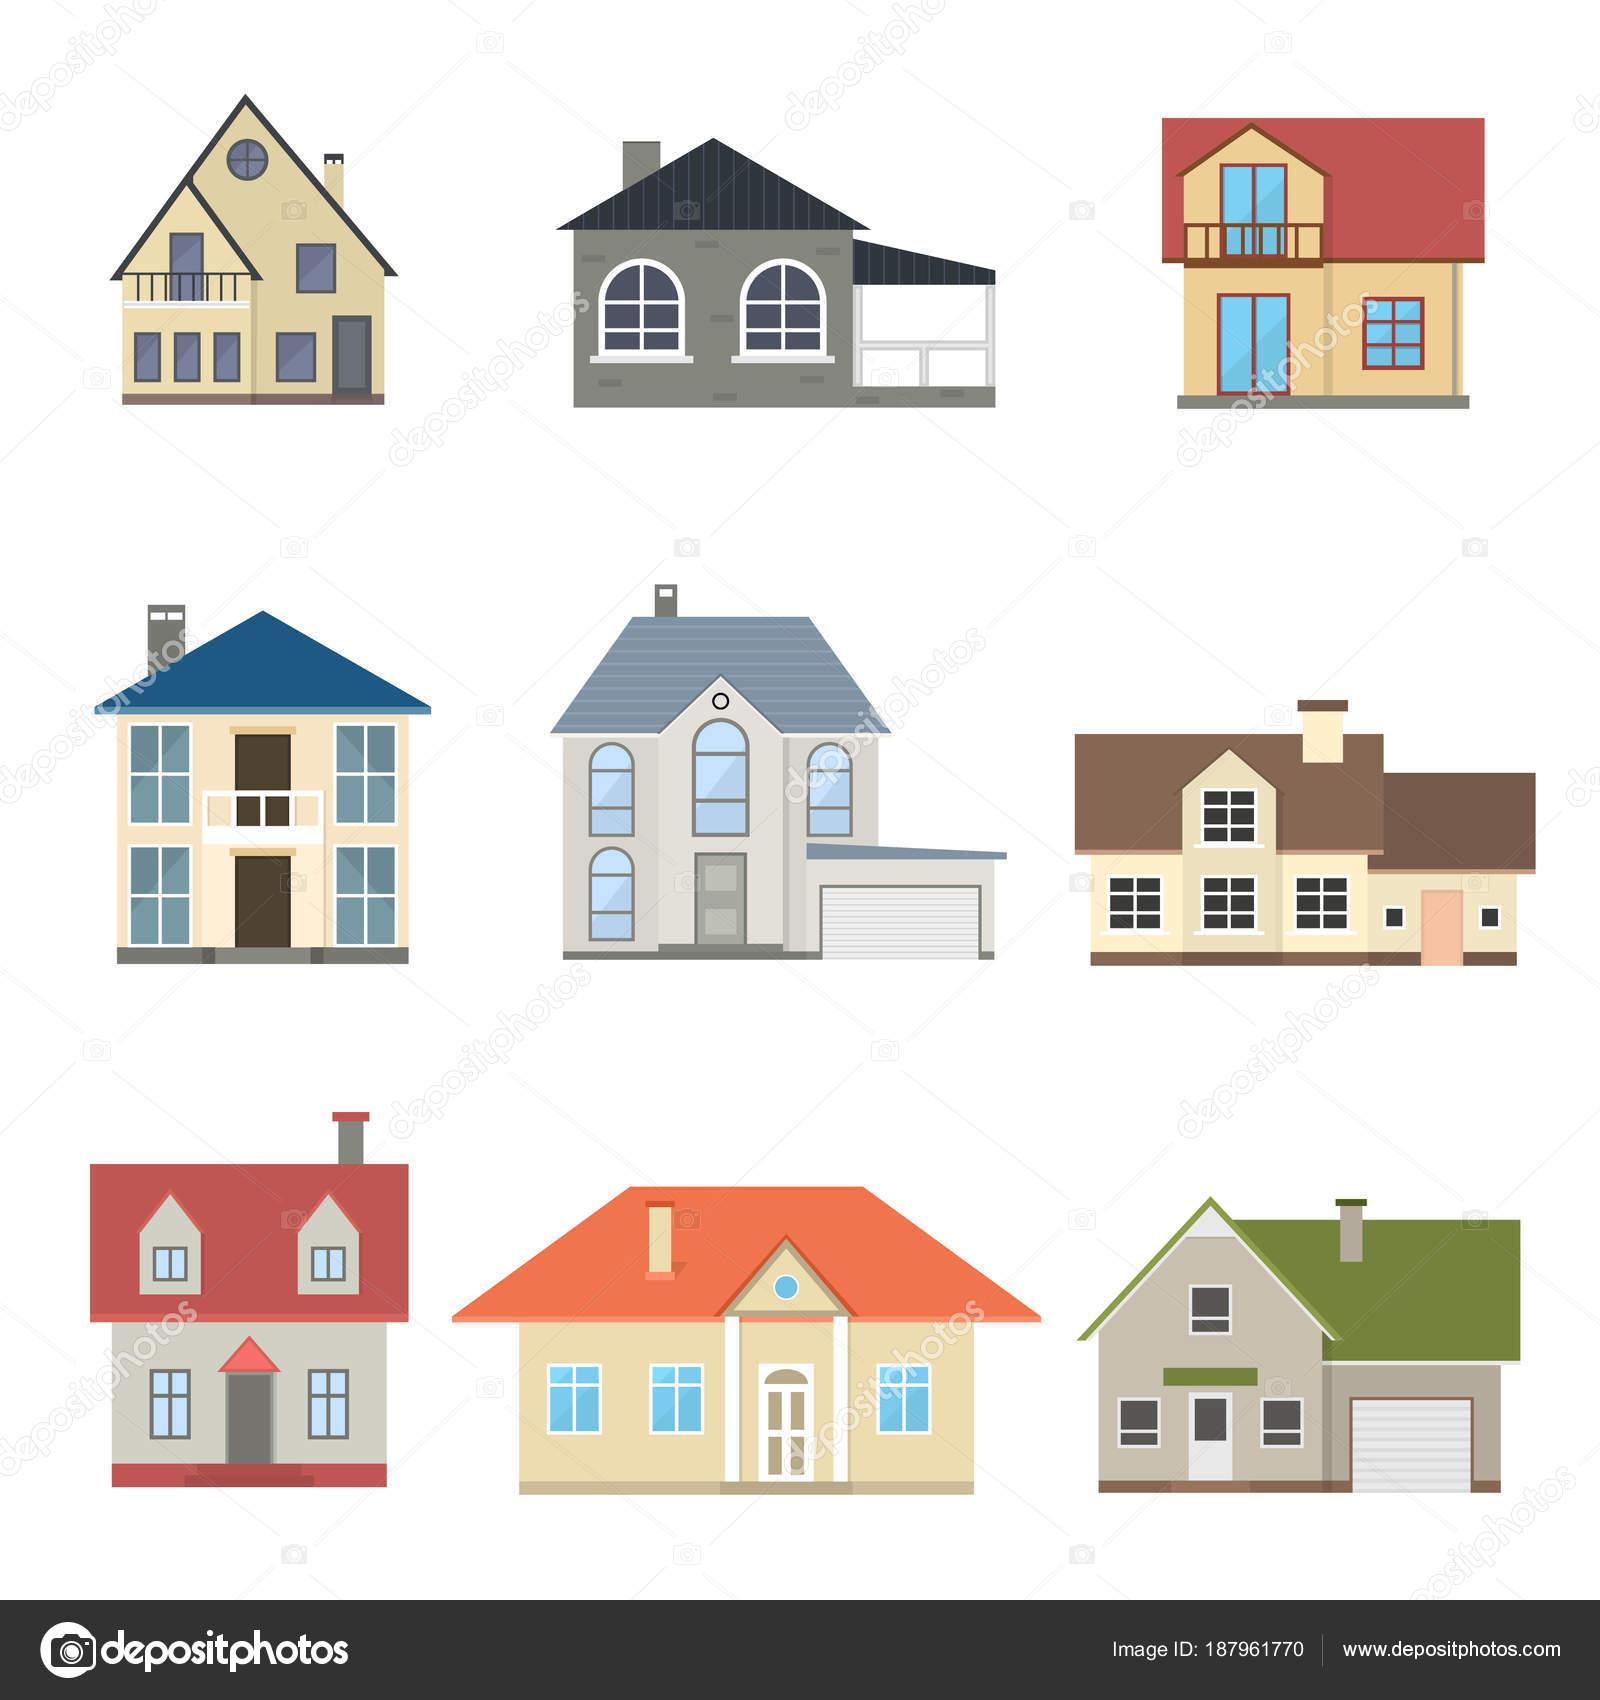 Cartoon Häuser Außenkulissen. Vektor — Stockvektor © bigmouse #187961770